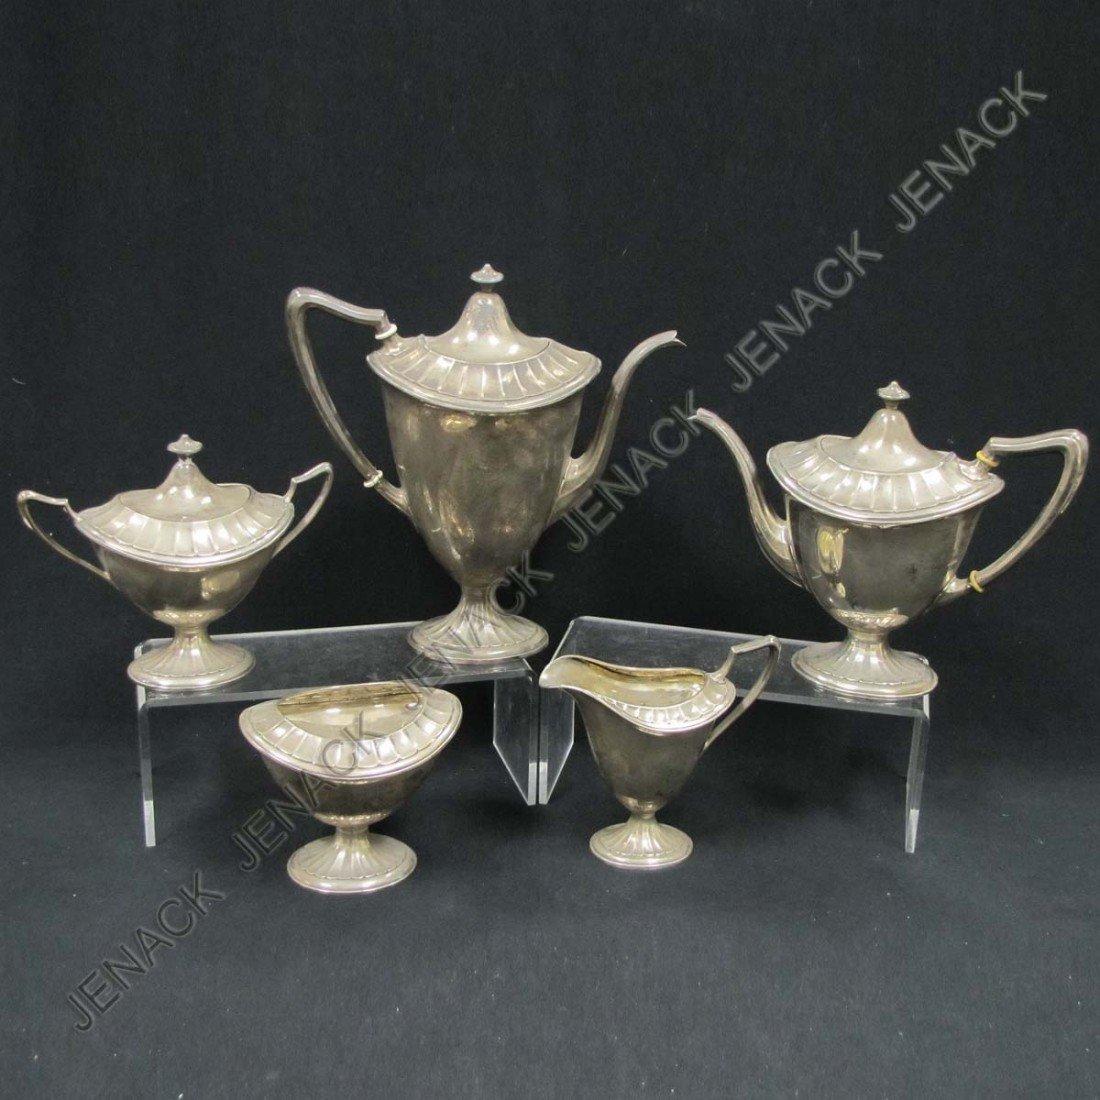 297: WALLACE SHERATON STYLE STERLING SILVER TEA/COFFEE